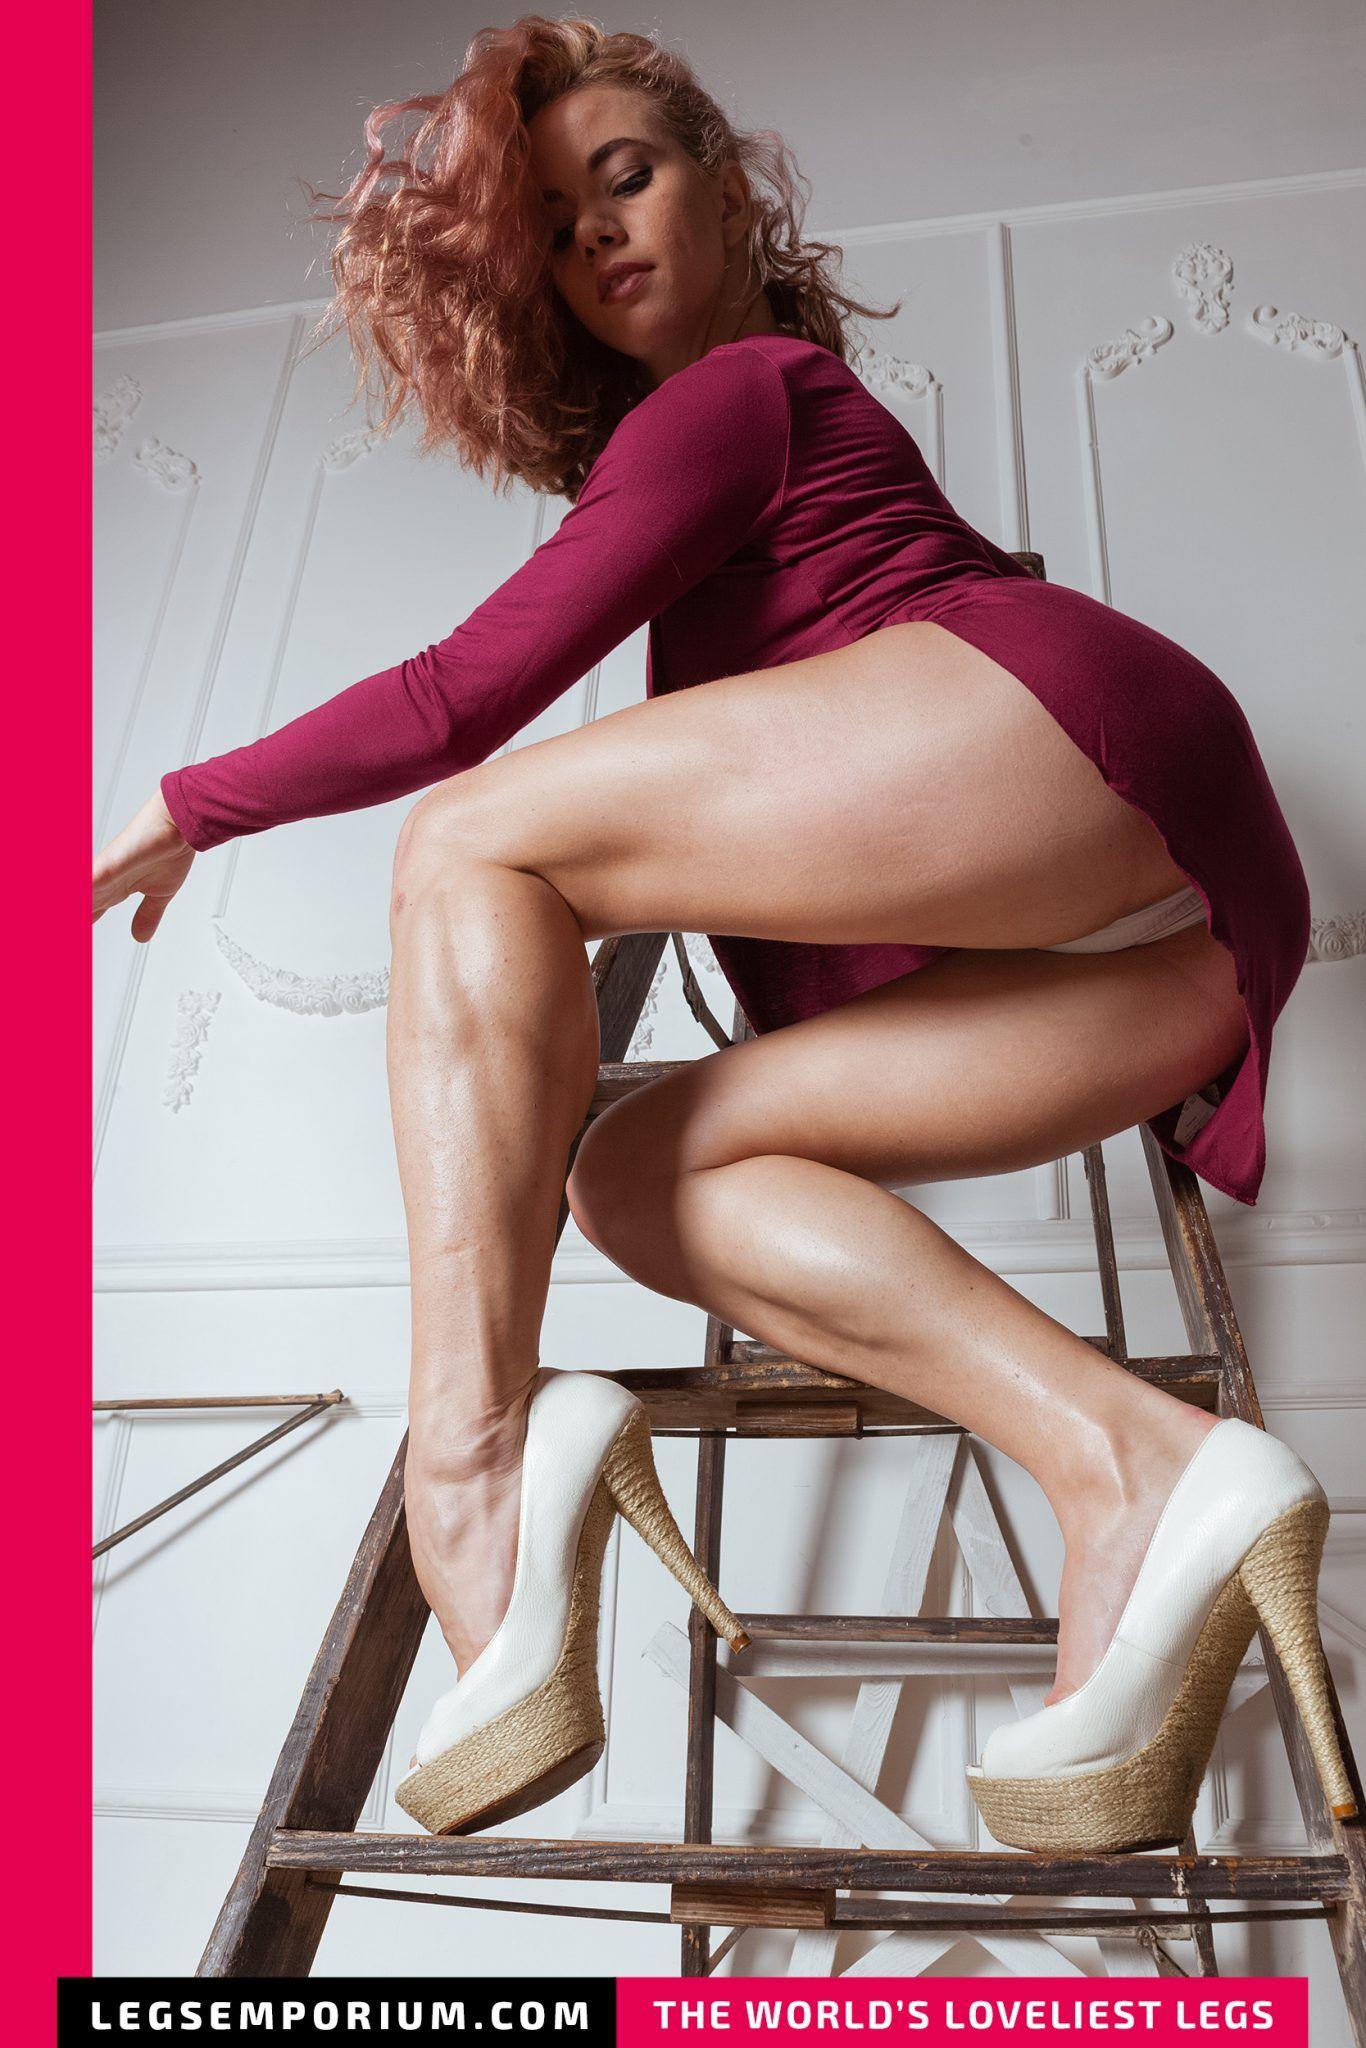 Cali doe hot massage | Erotic photos)